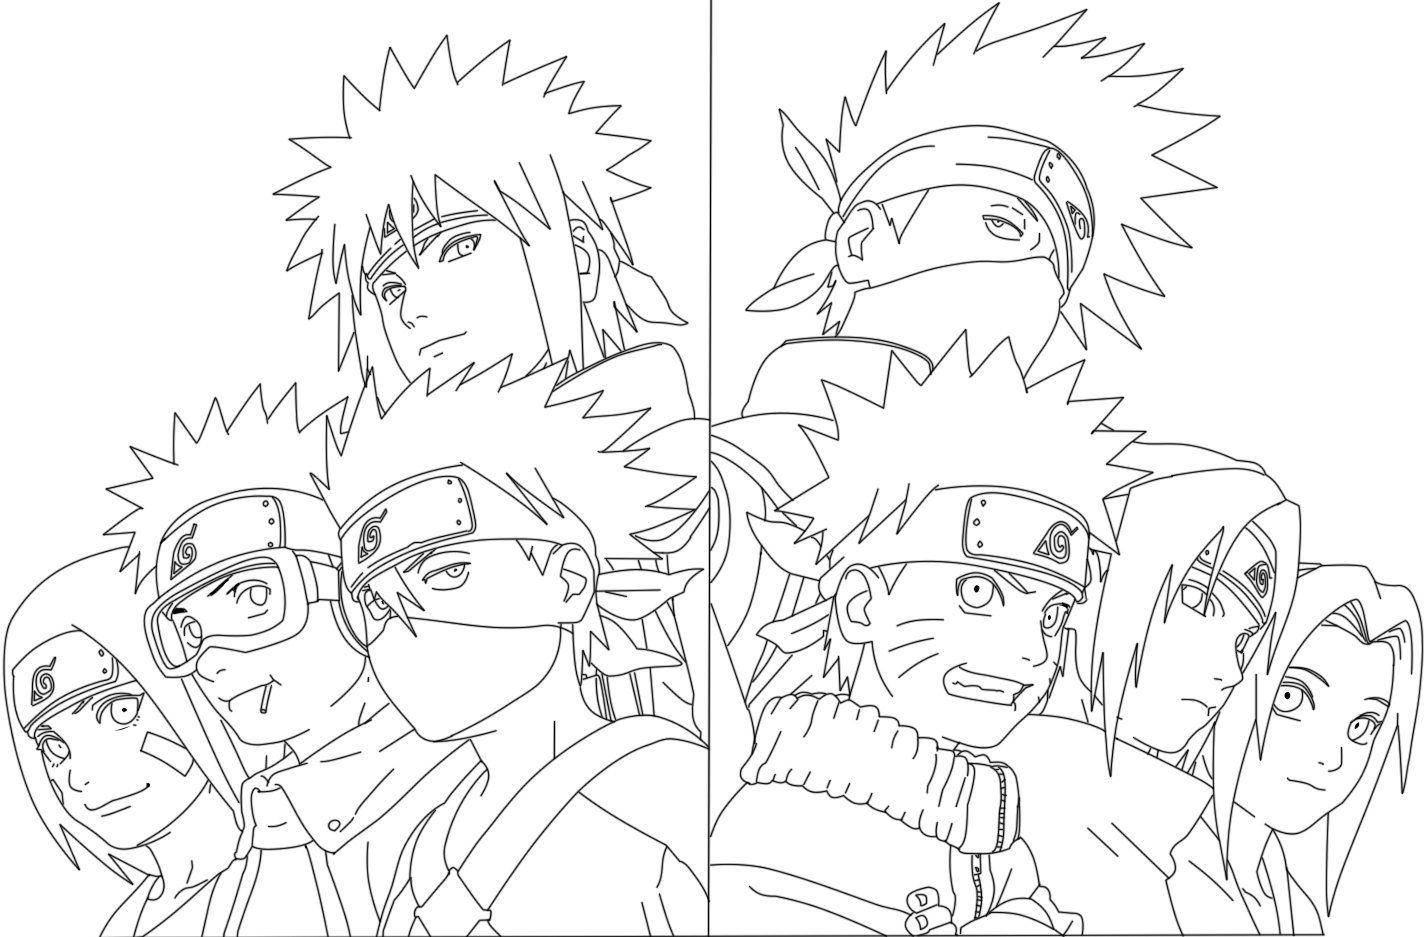 Complete Artbook Naruto Line By Https Www Deviantart Com Kenshiuchiha On Deviantart Naruto Drawings Naruto Sketch Drawing Naruto Art